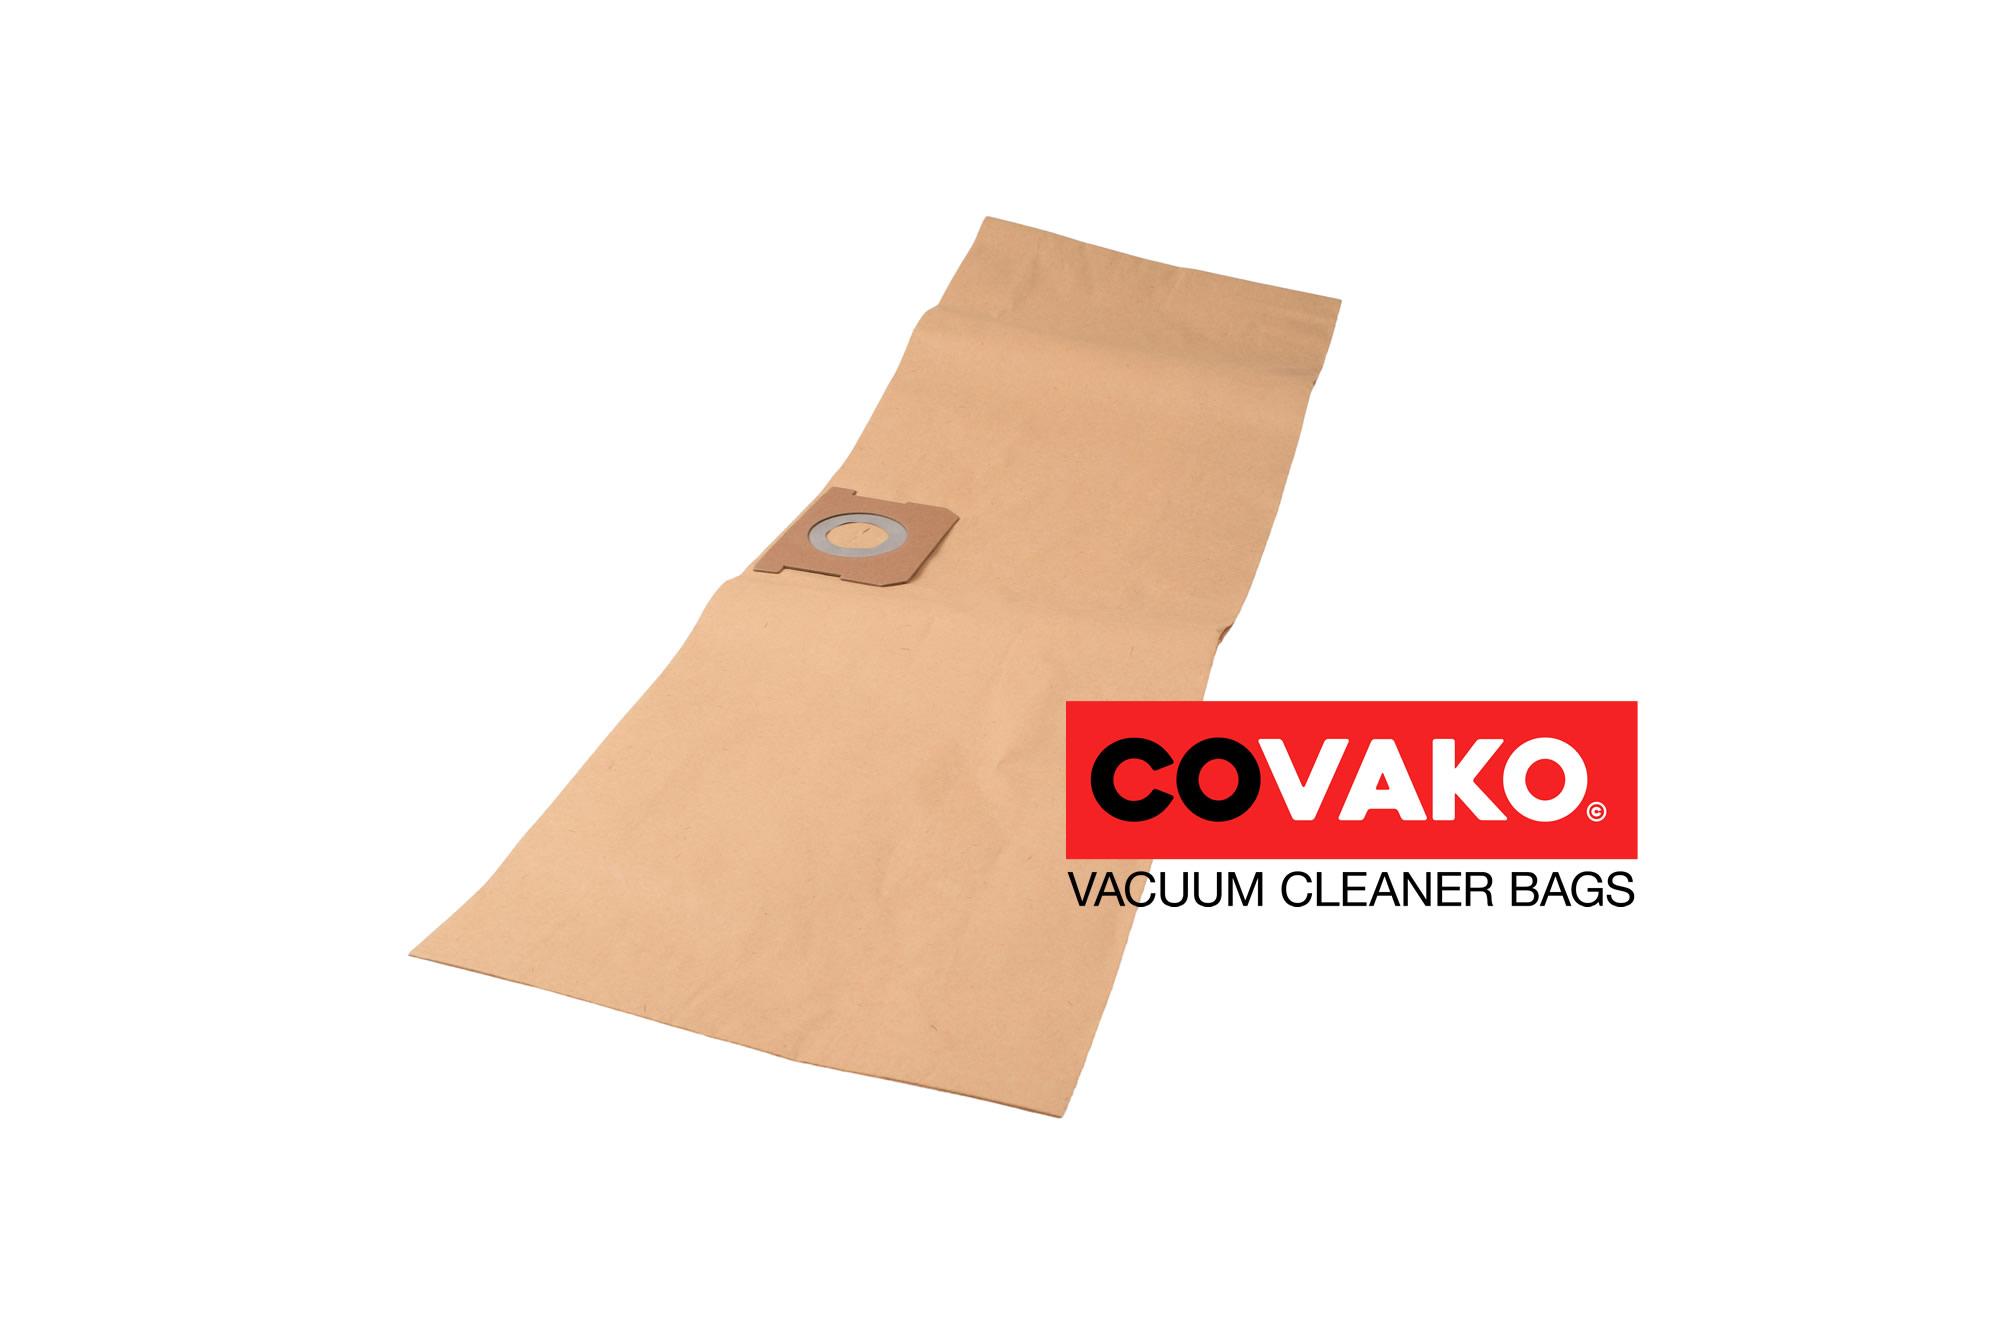 Sorma TM 370 / Papier - Sorma stofzuigerzakken